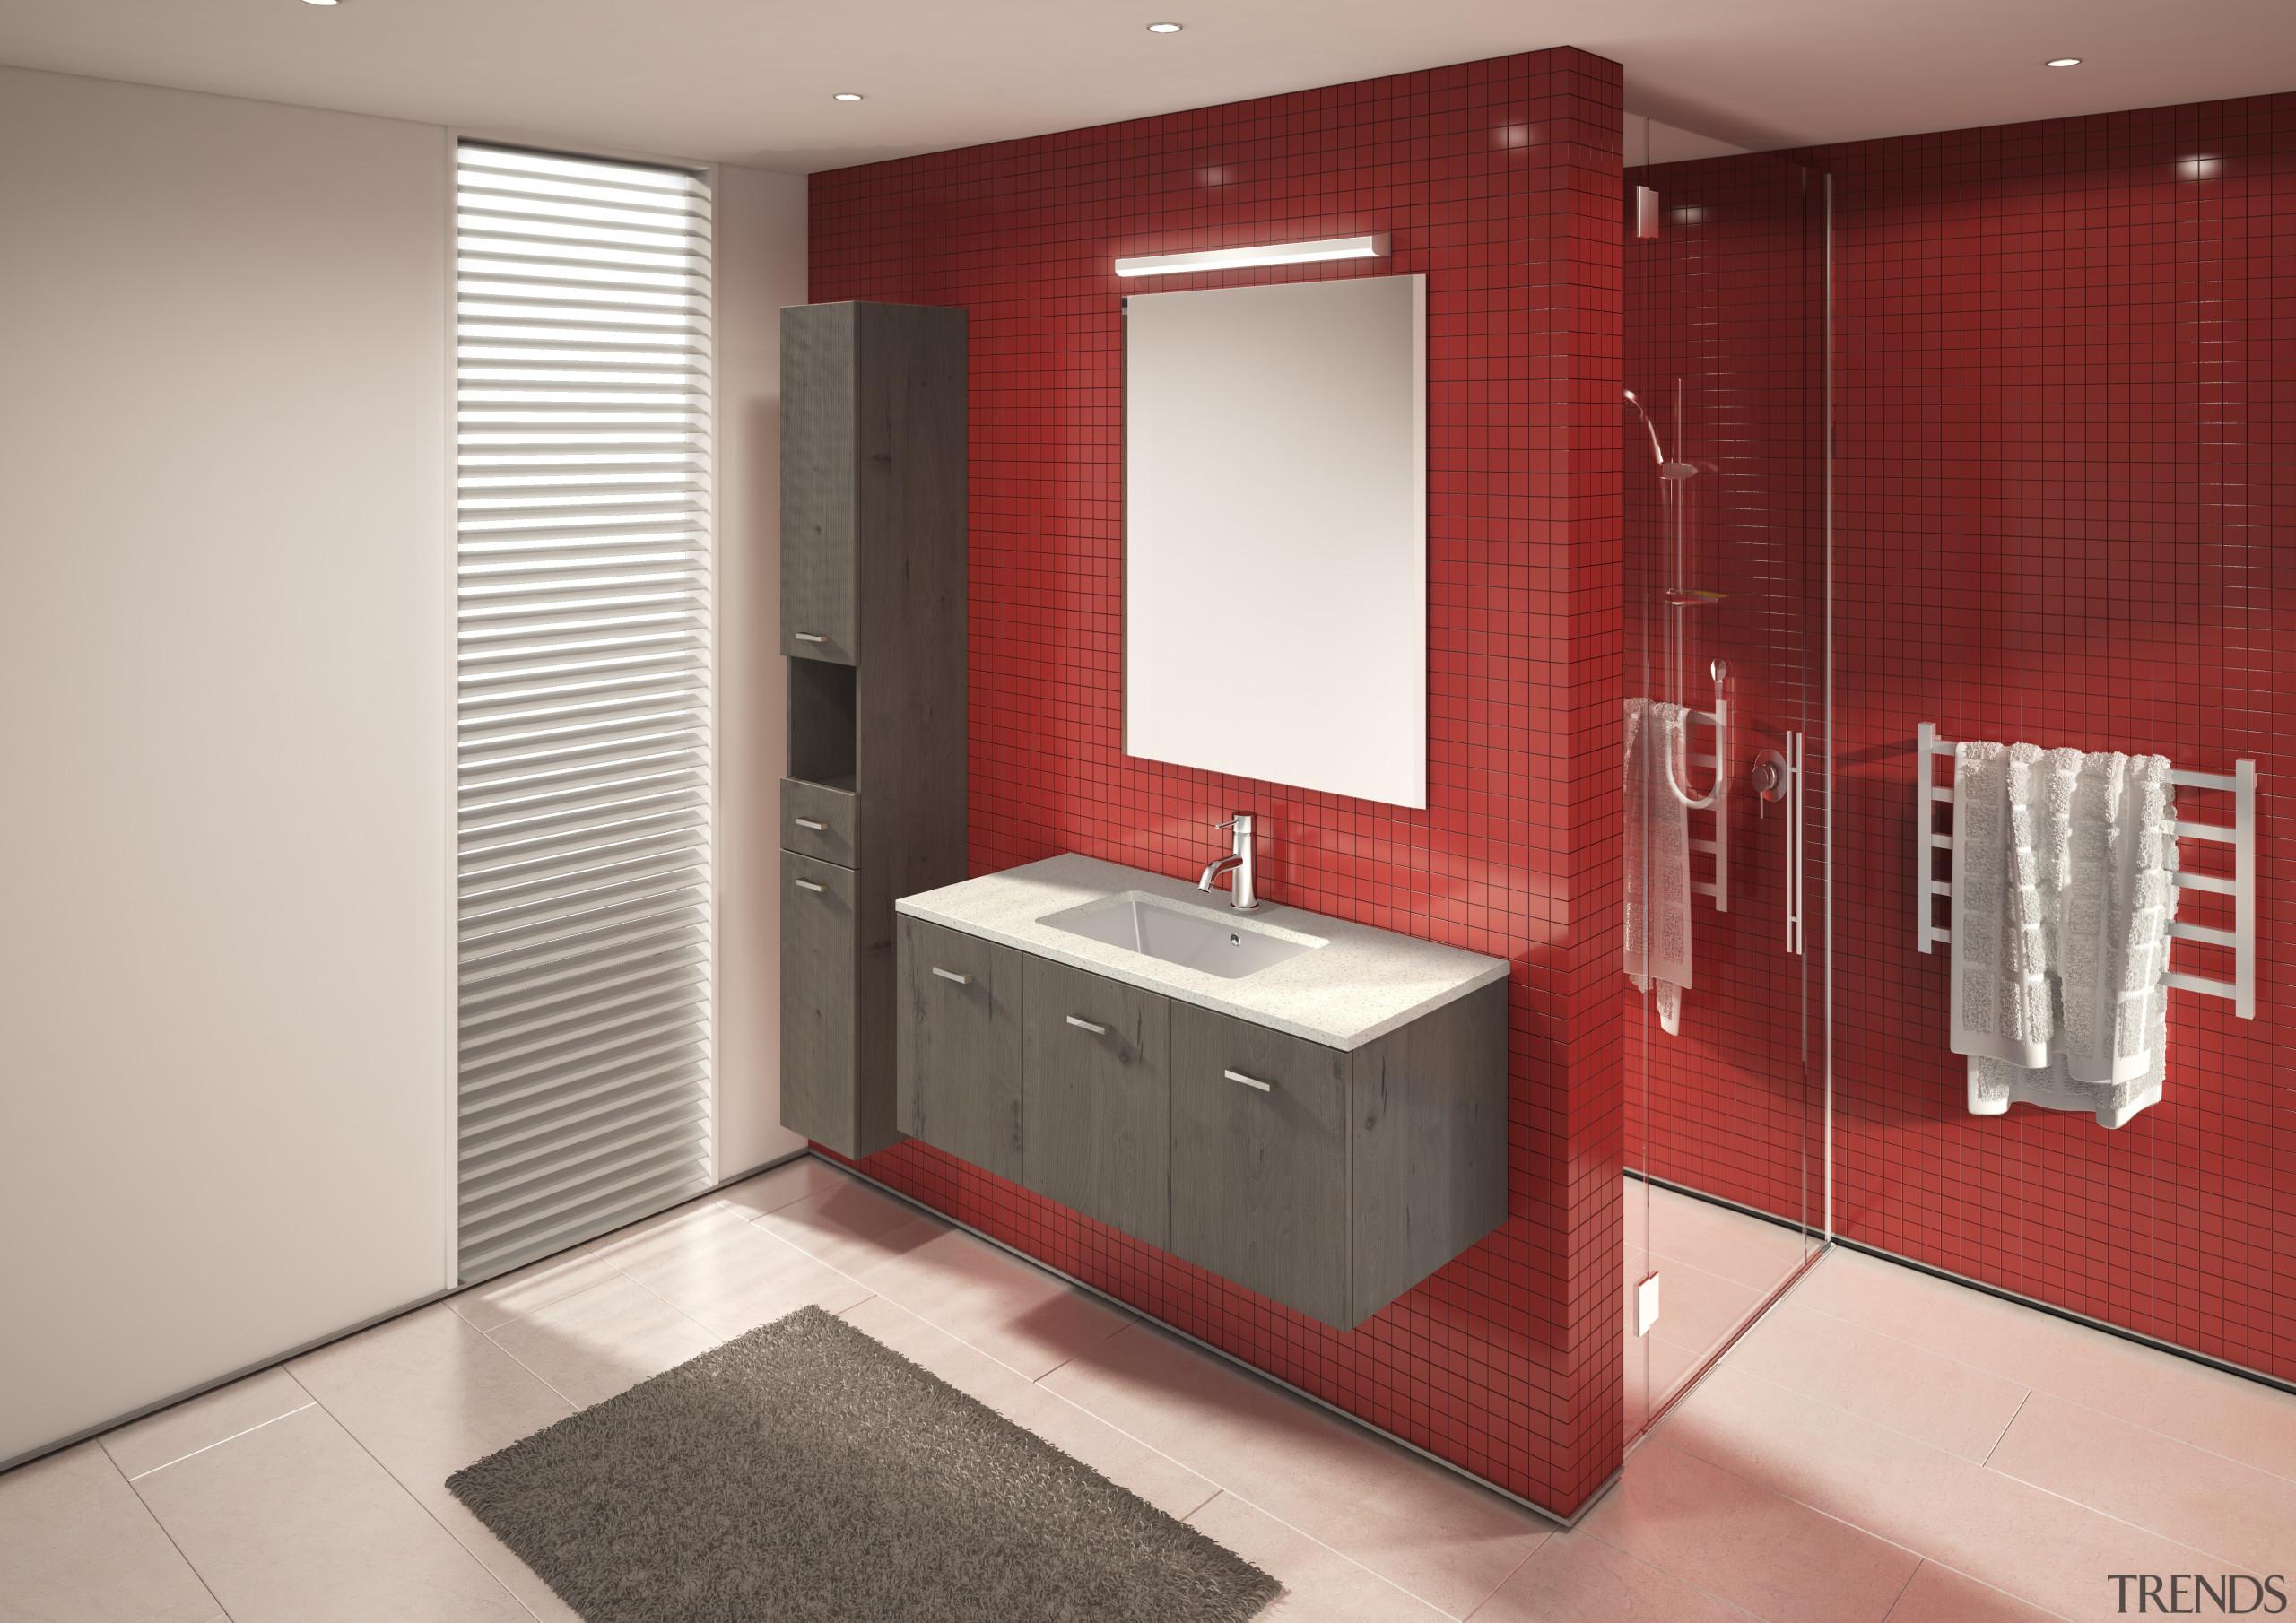 Key bathroom ideas like this one can be bathroom, bathroom accessory, bathroom cabinet, interior design, product design, room, gray, red